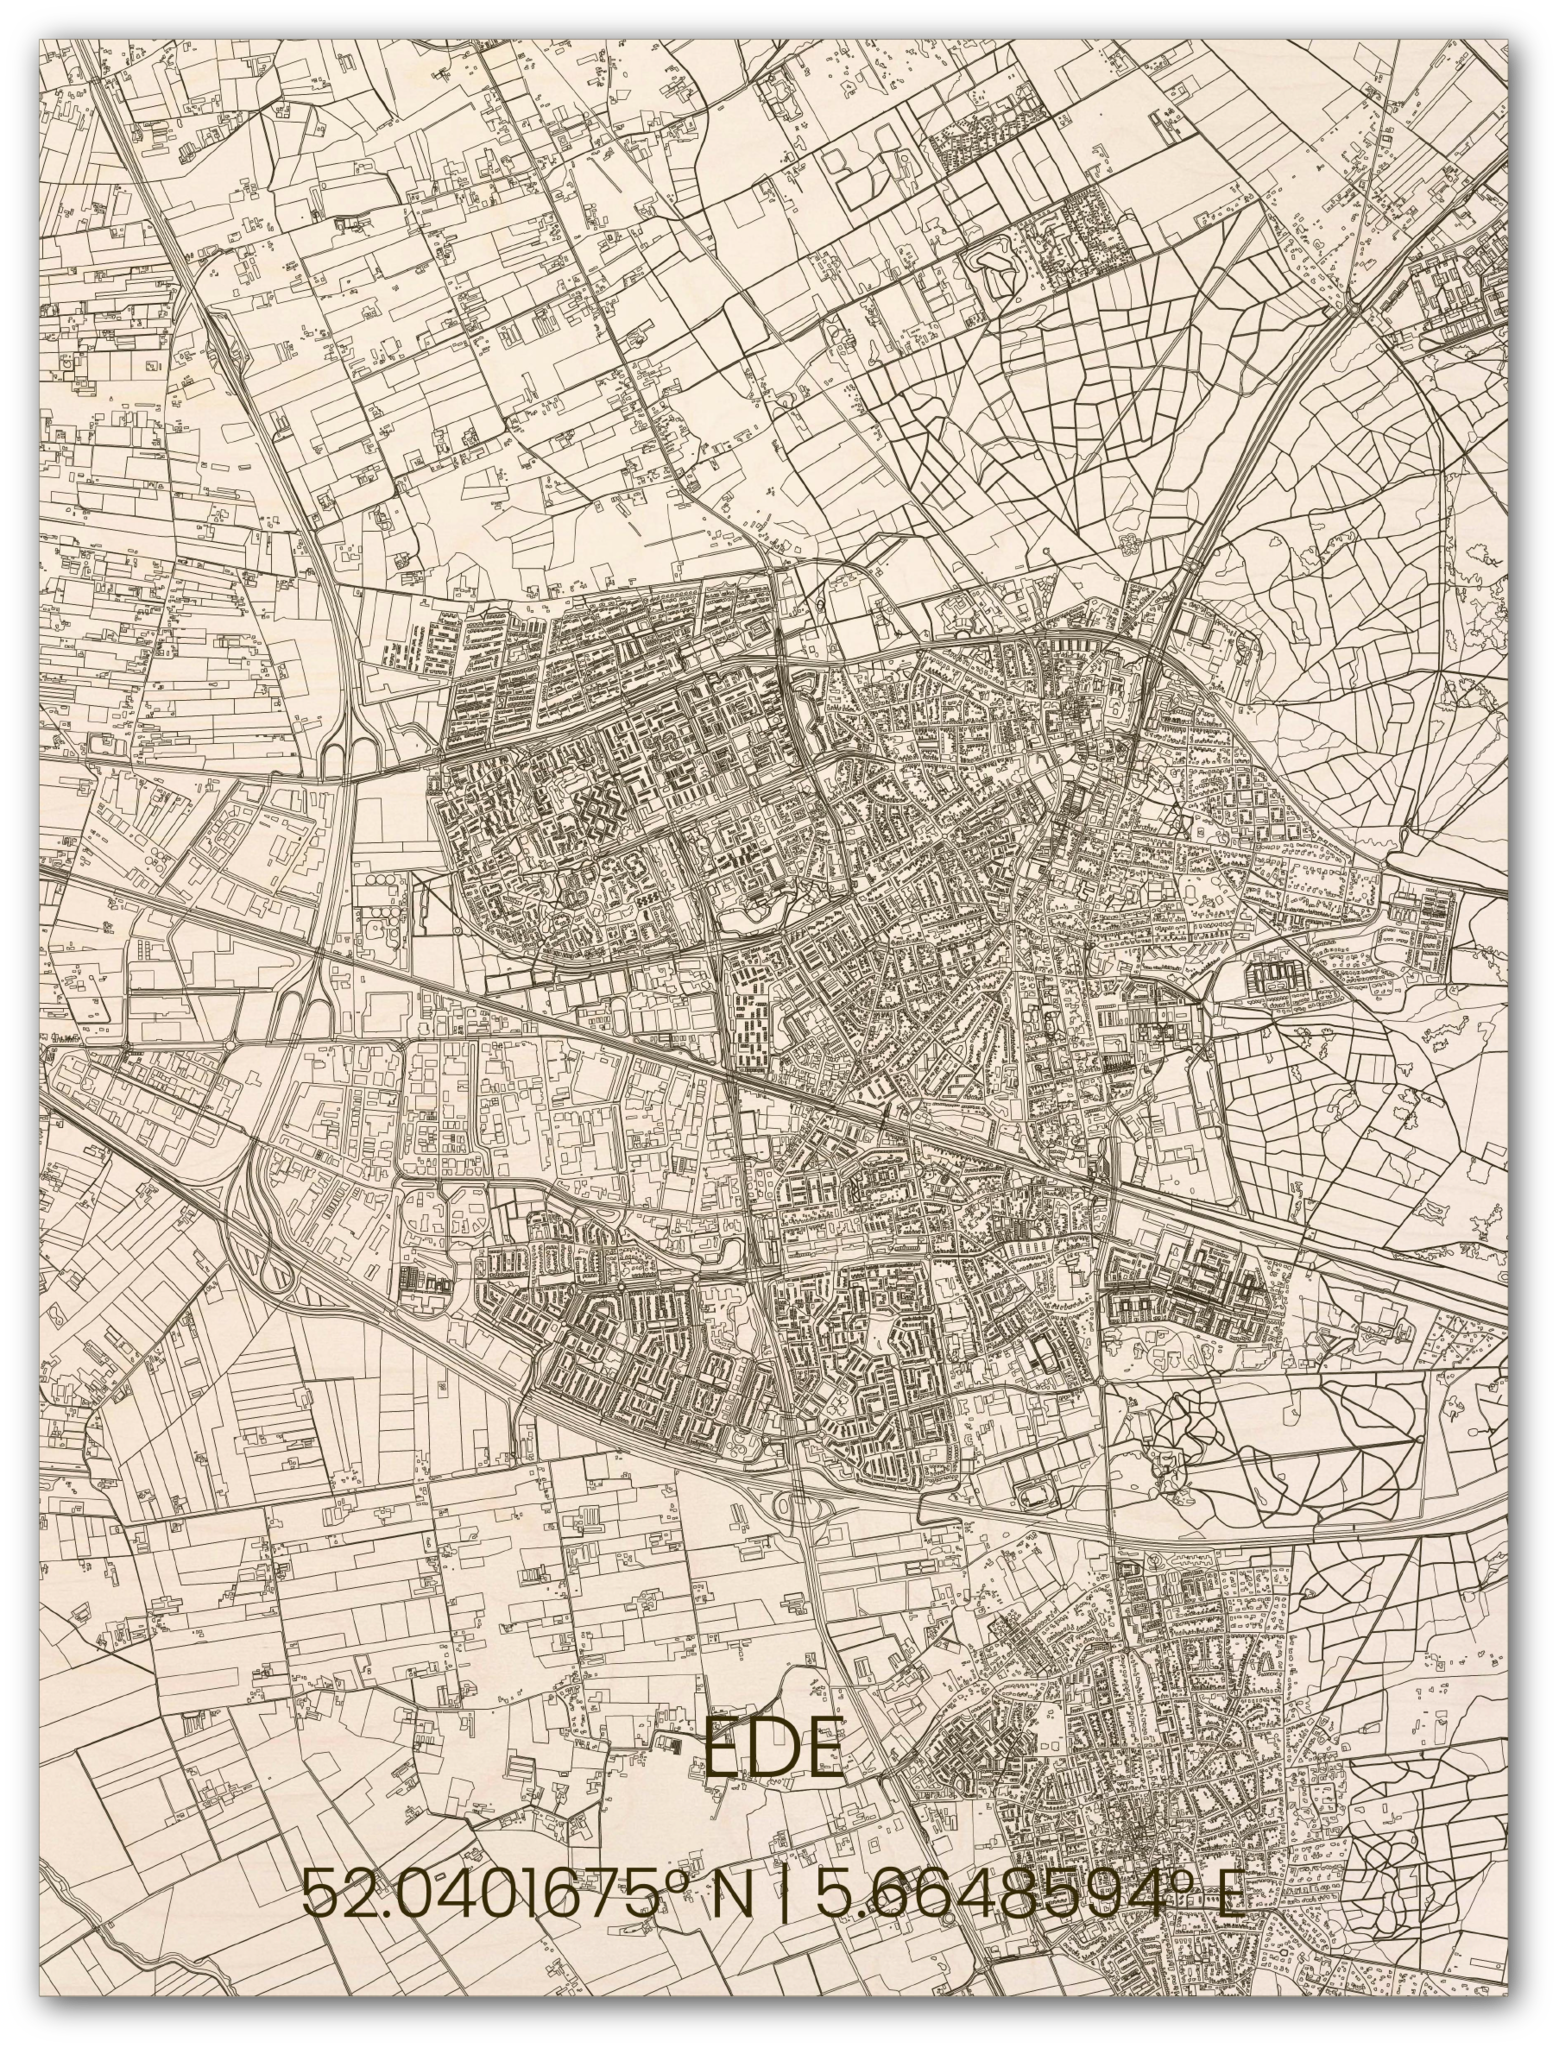 Houten stadsplattegrond Ede-1